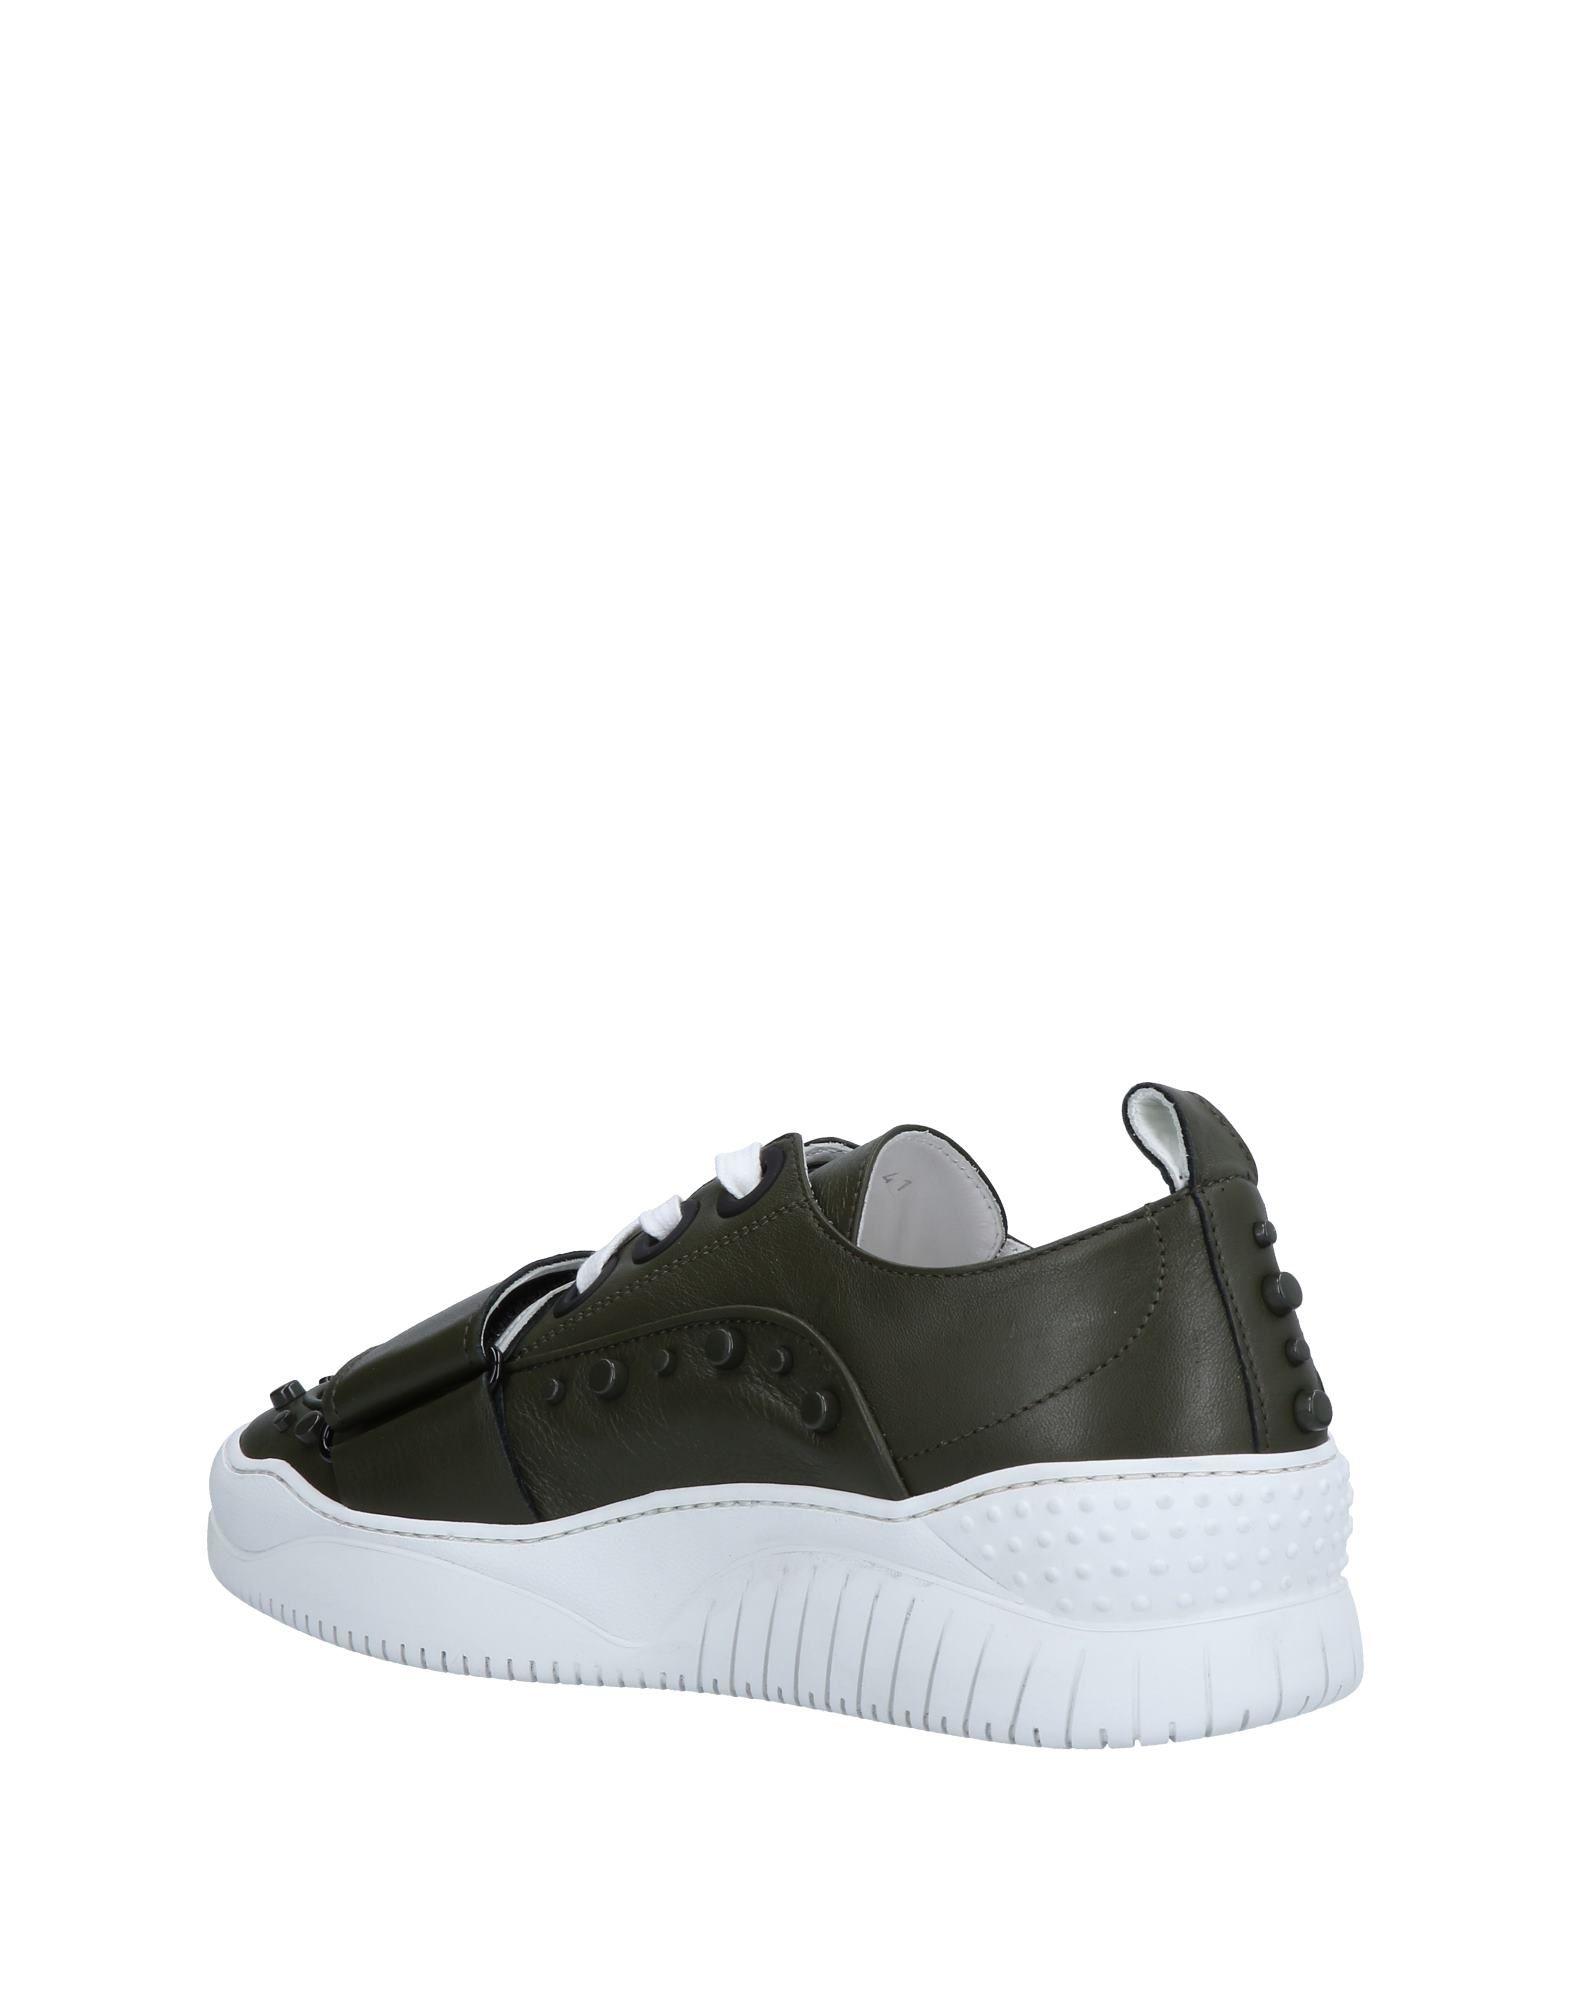 N° 21 Sneakers Herren  11521561AB Gute Qualität beliebte Schuhe